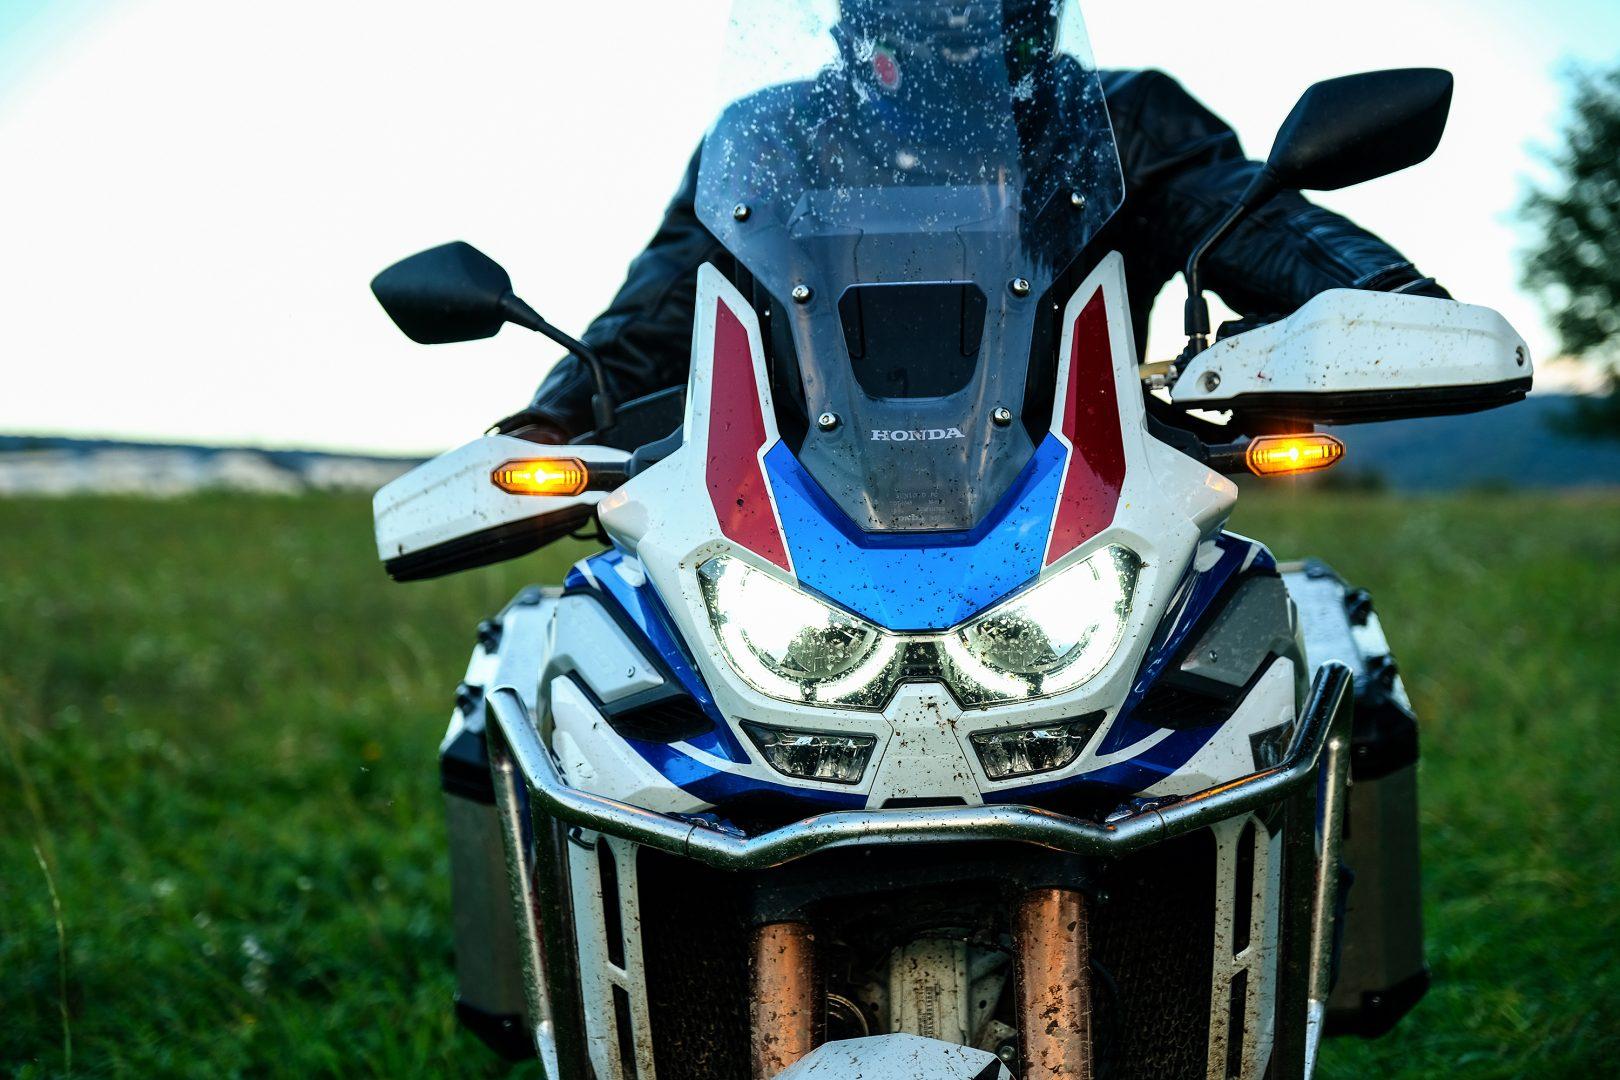 honda africa twin adventure sports test recenzia recenze foto Fotky led svetla testy motocyklov enduro